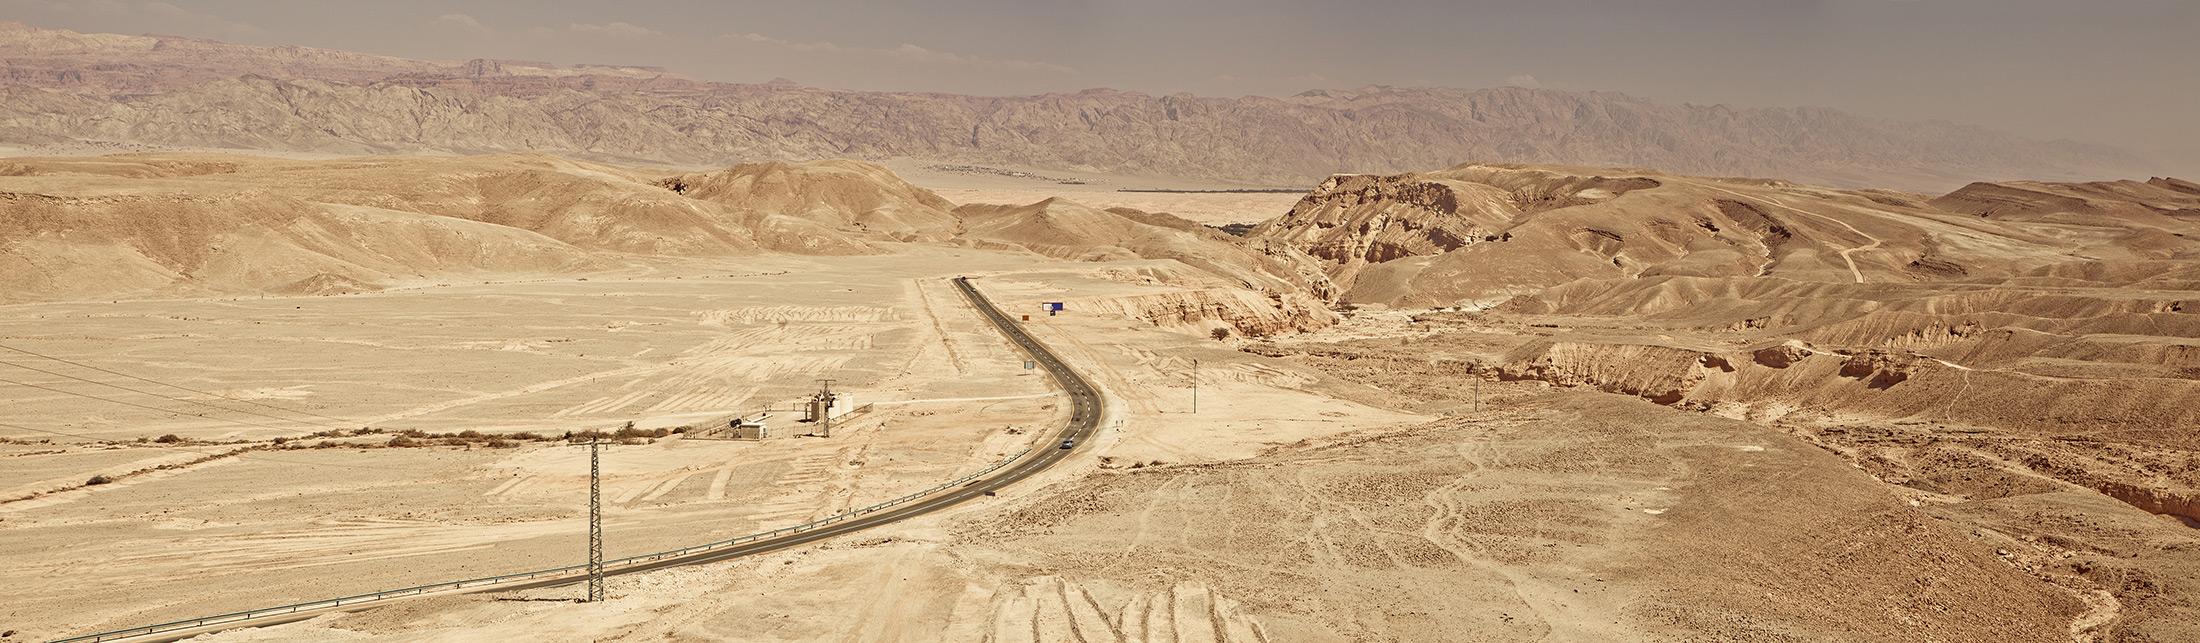 road-through-yellow-desert.jpg